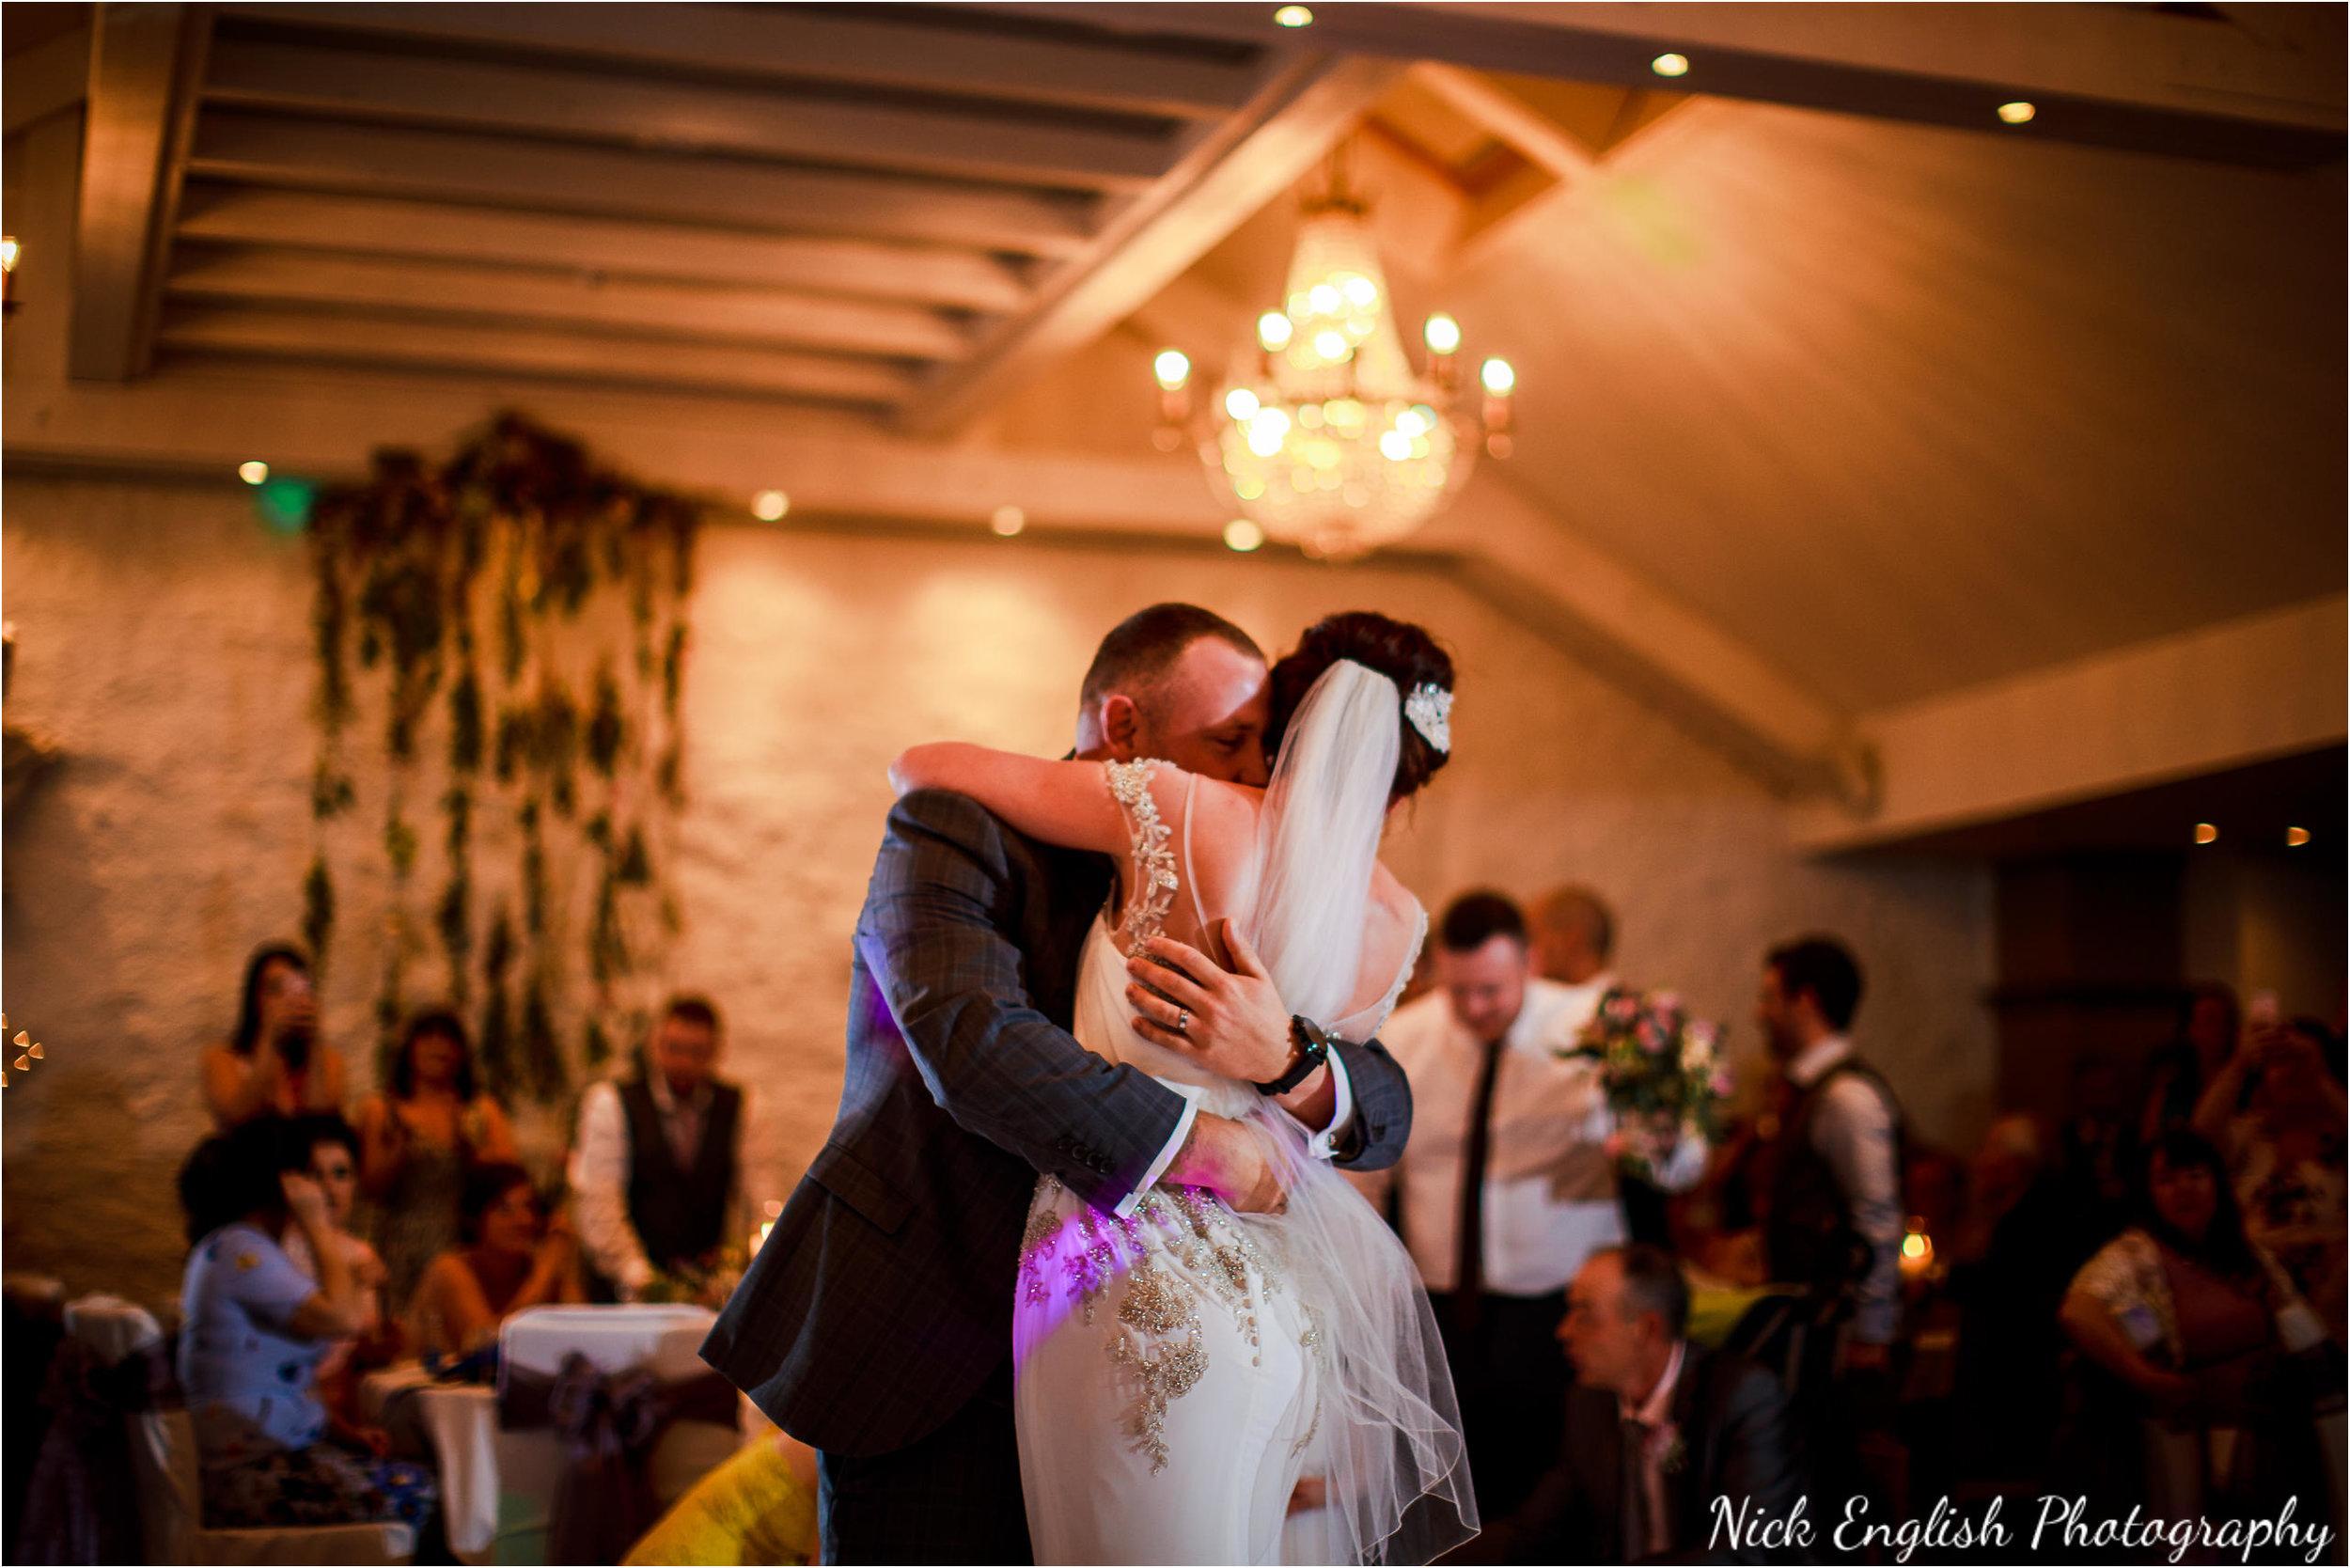 Stacey-Ash-Wedding-Photographs-Stanley-House-Preston-Lancashire-250.jpg